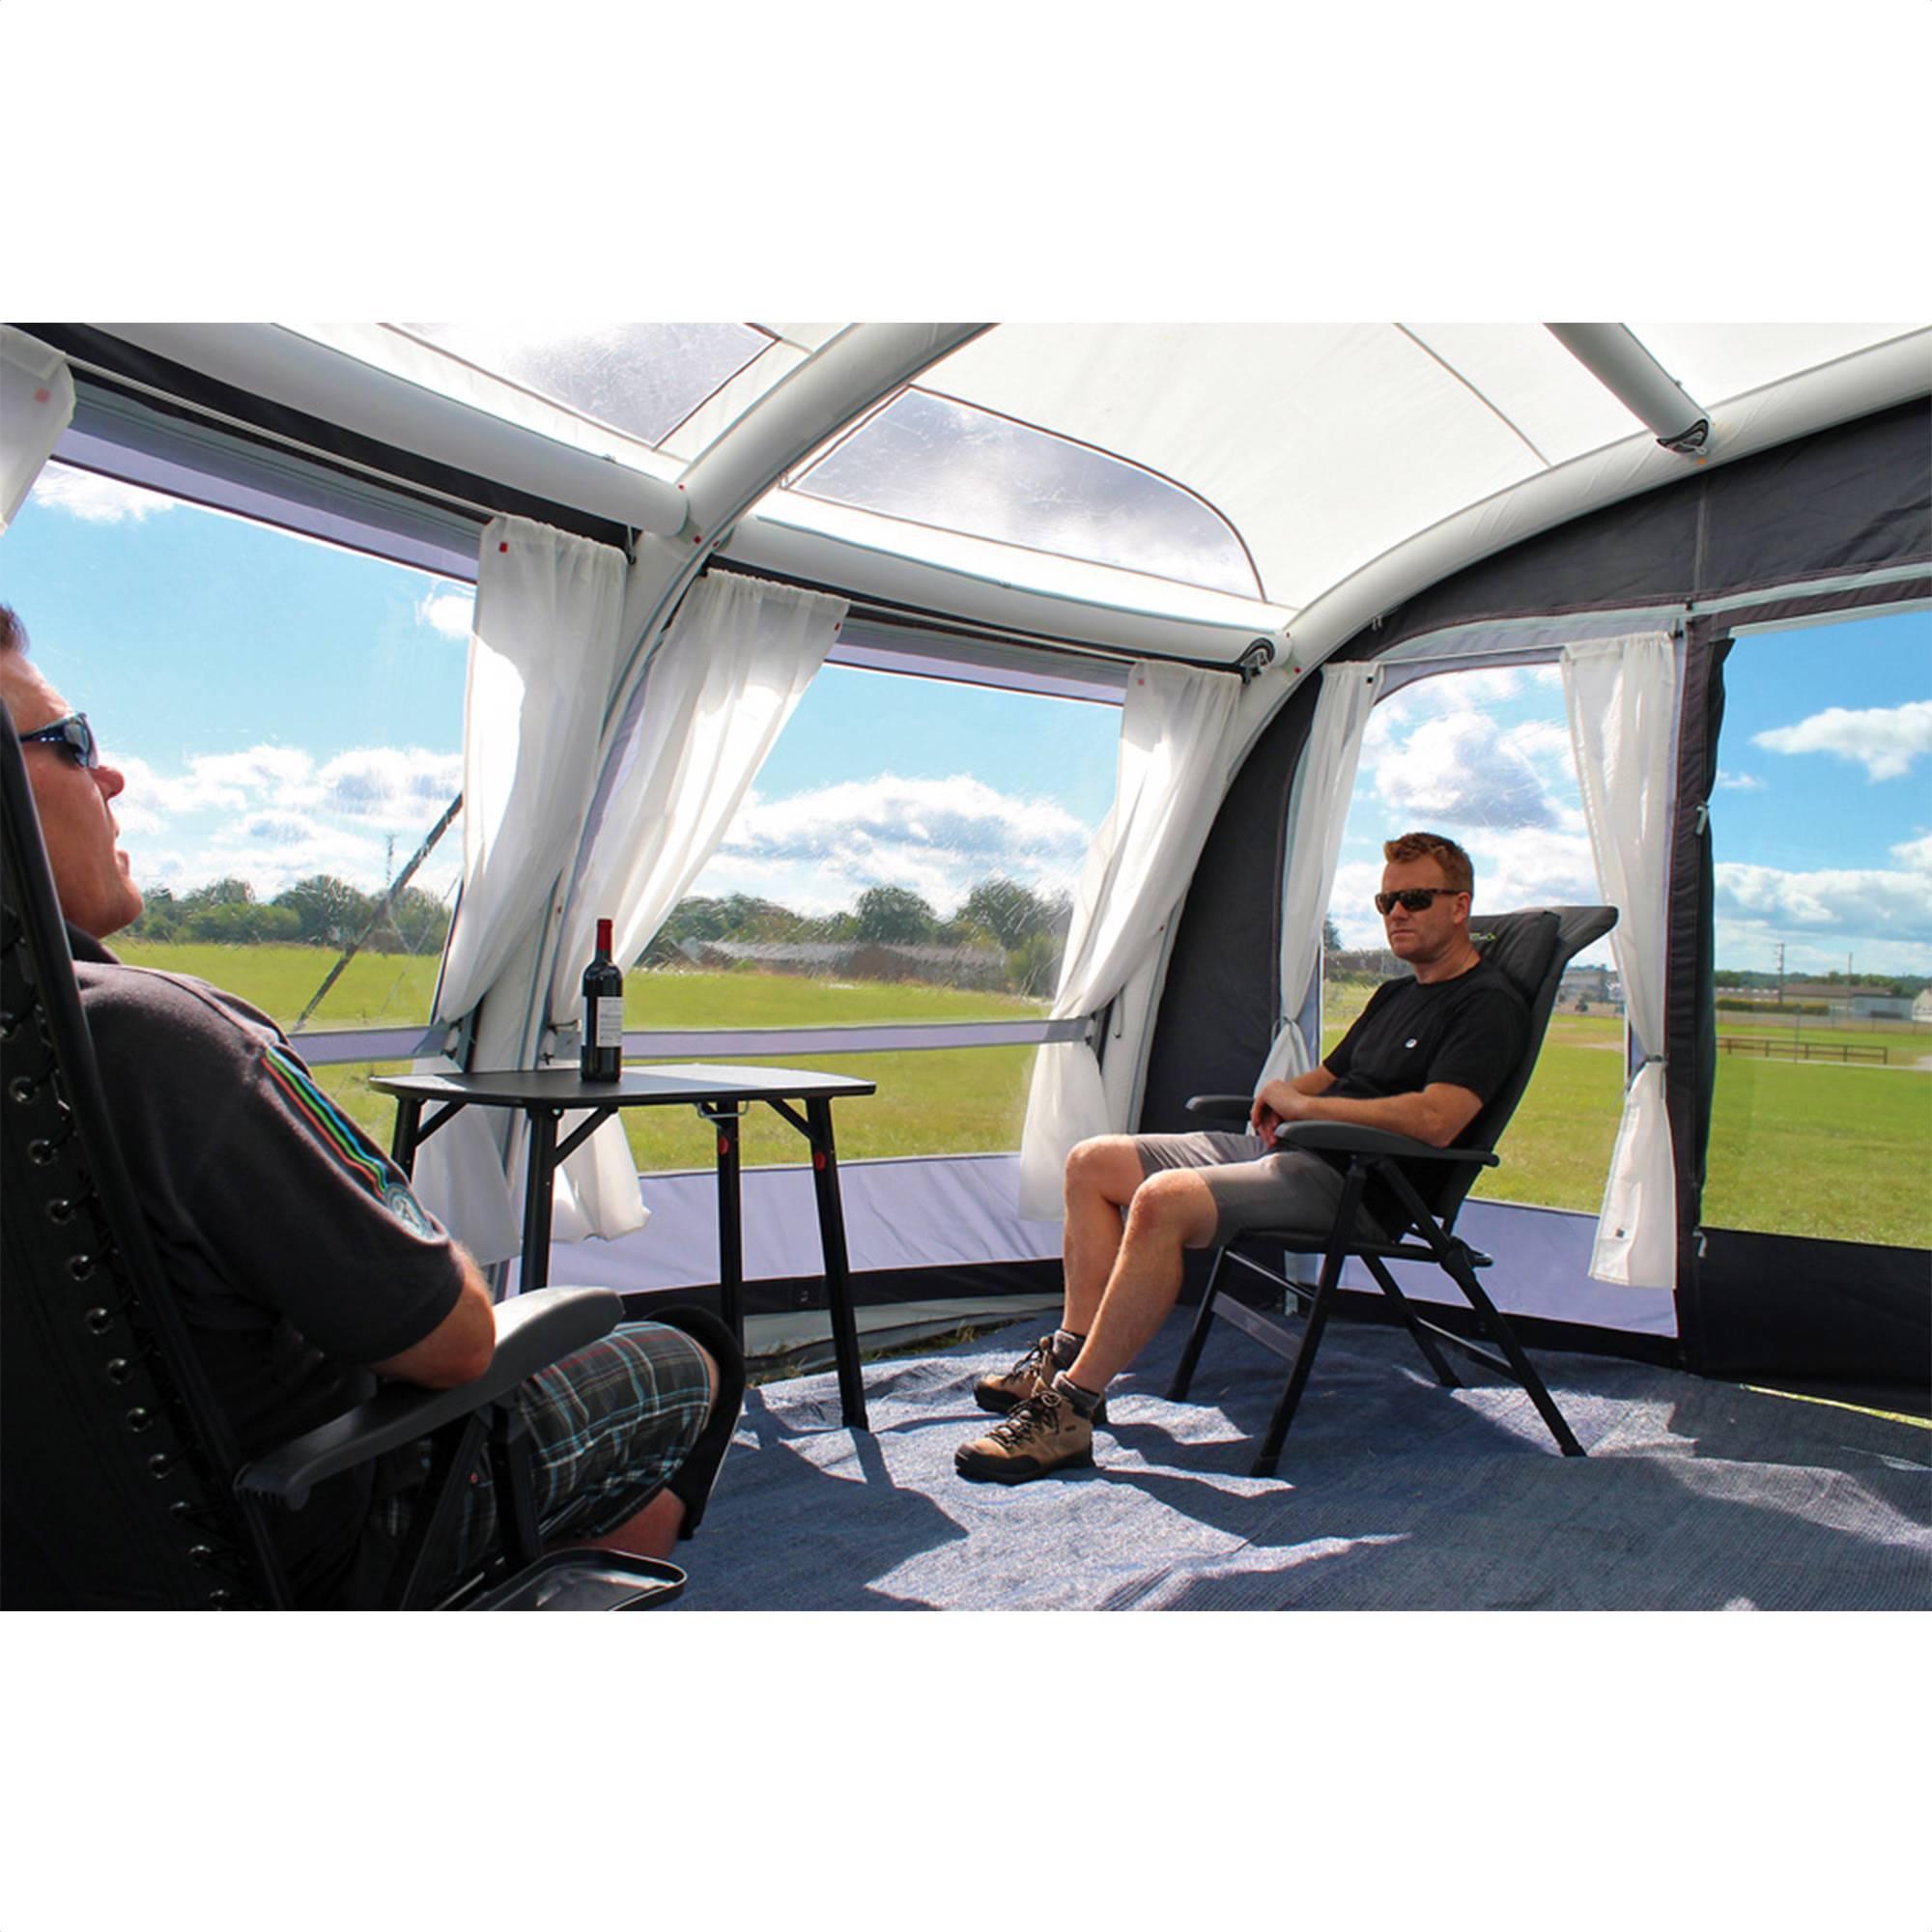 Outdoor Revolution Esprit 360 Pro Caravan Awning